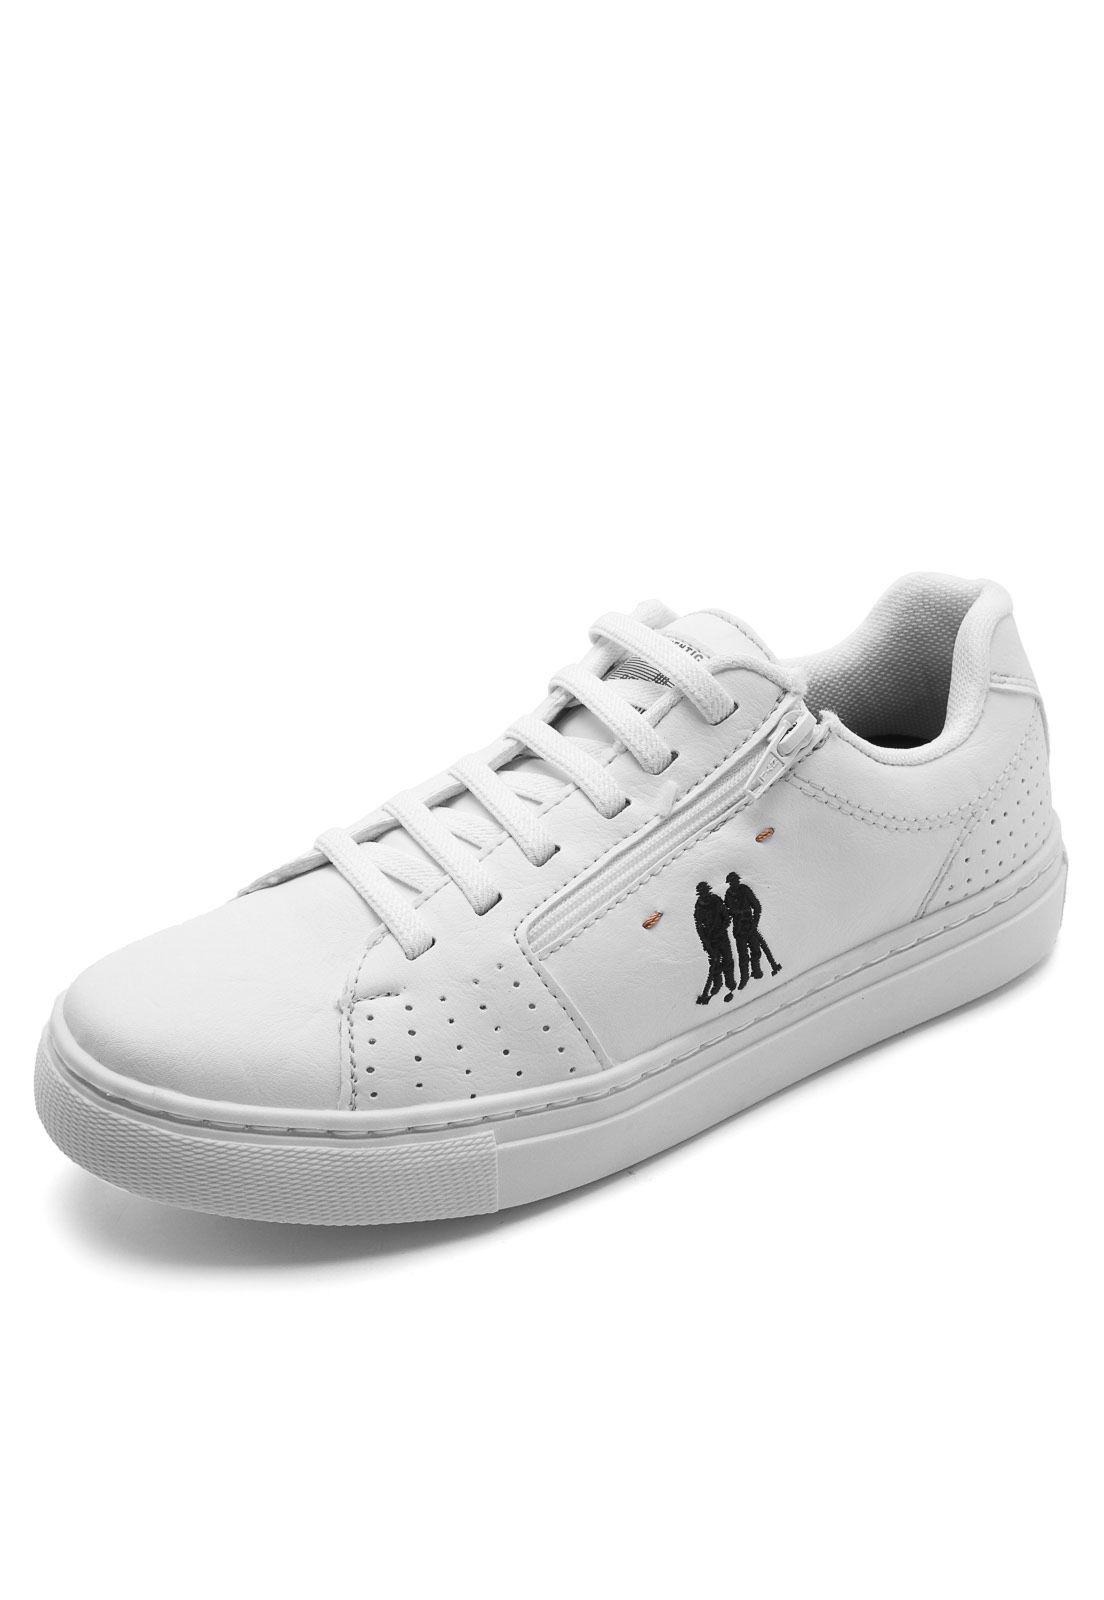 Sapatênis Polo Wear Logo Branco | Polo wear, Sapatenis polo